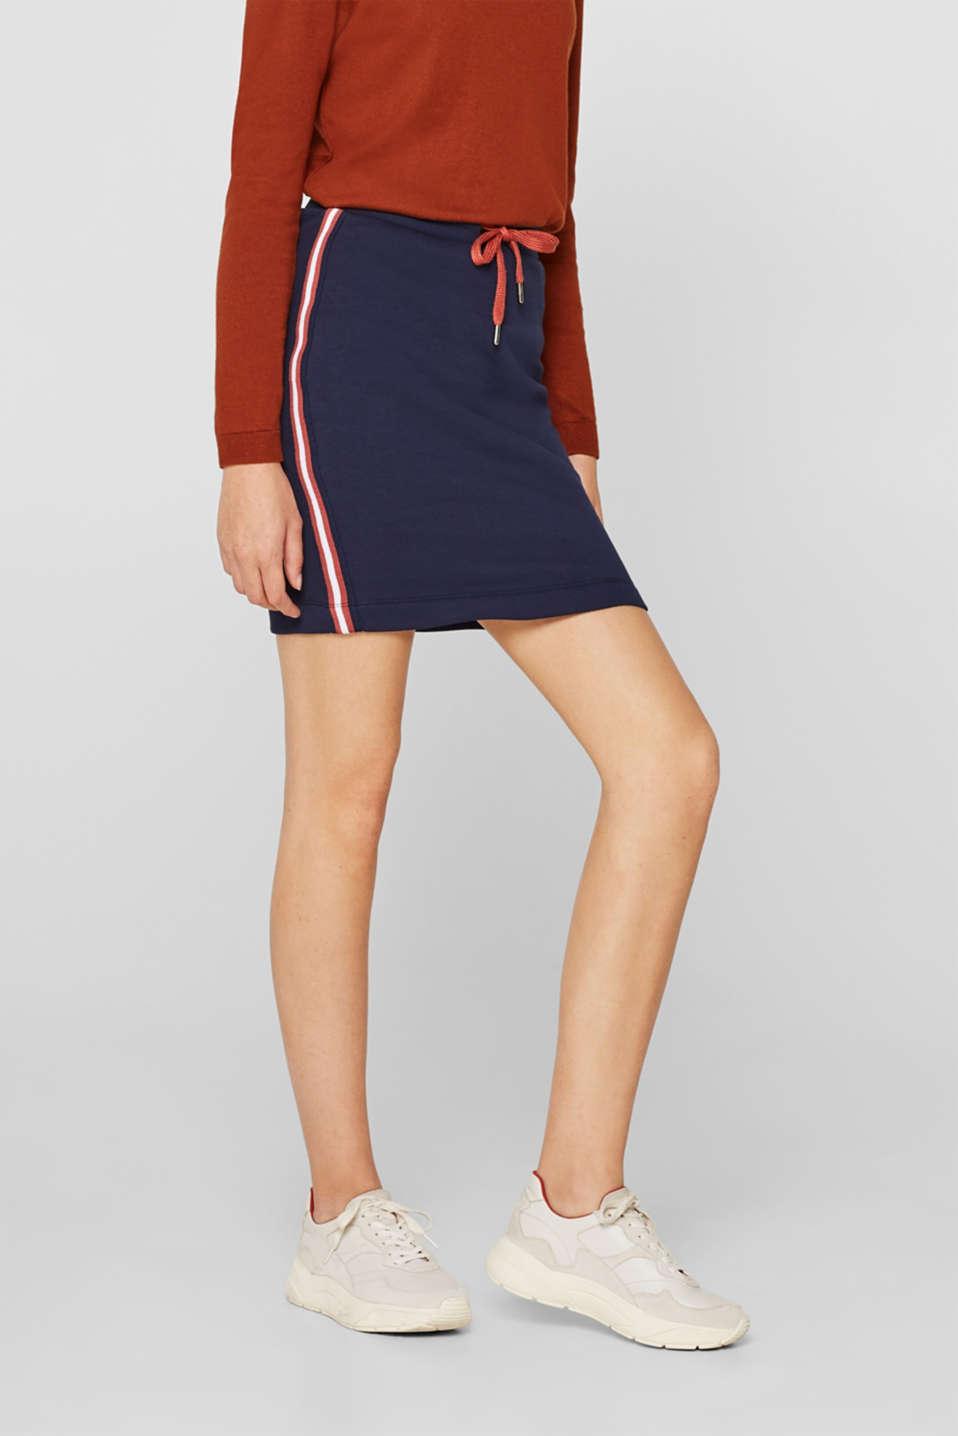 Sweatshirt skirt with racing stripes, NAVY, detail image number 5